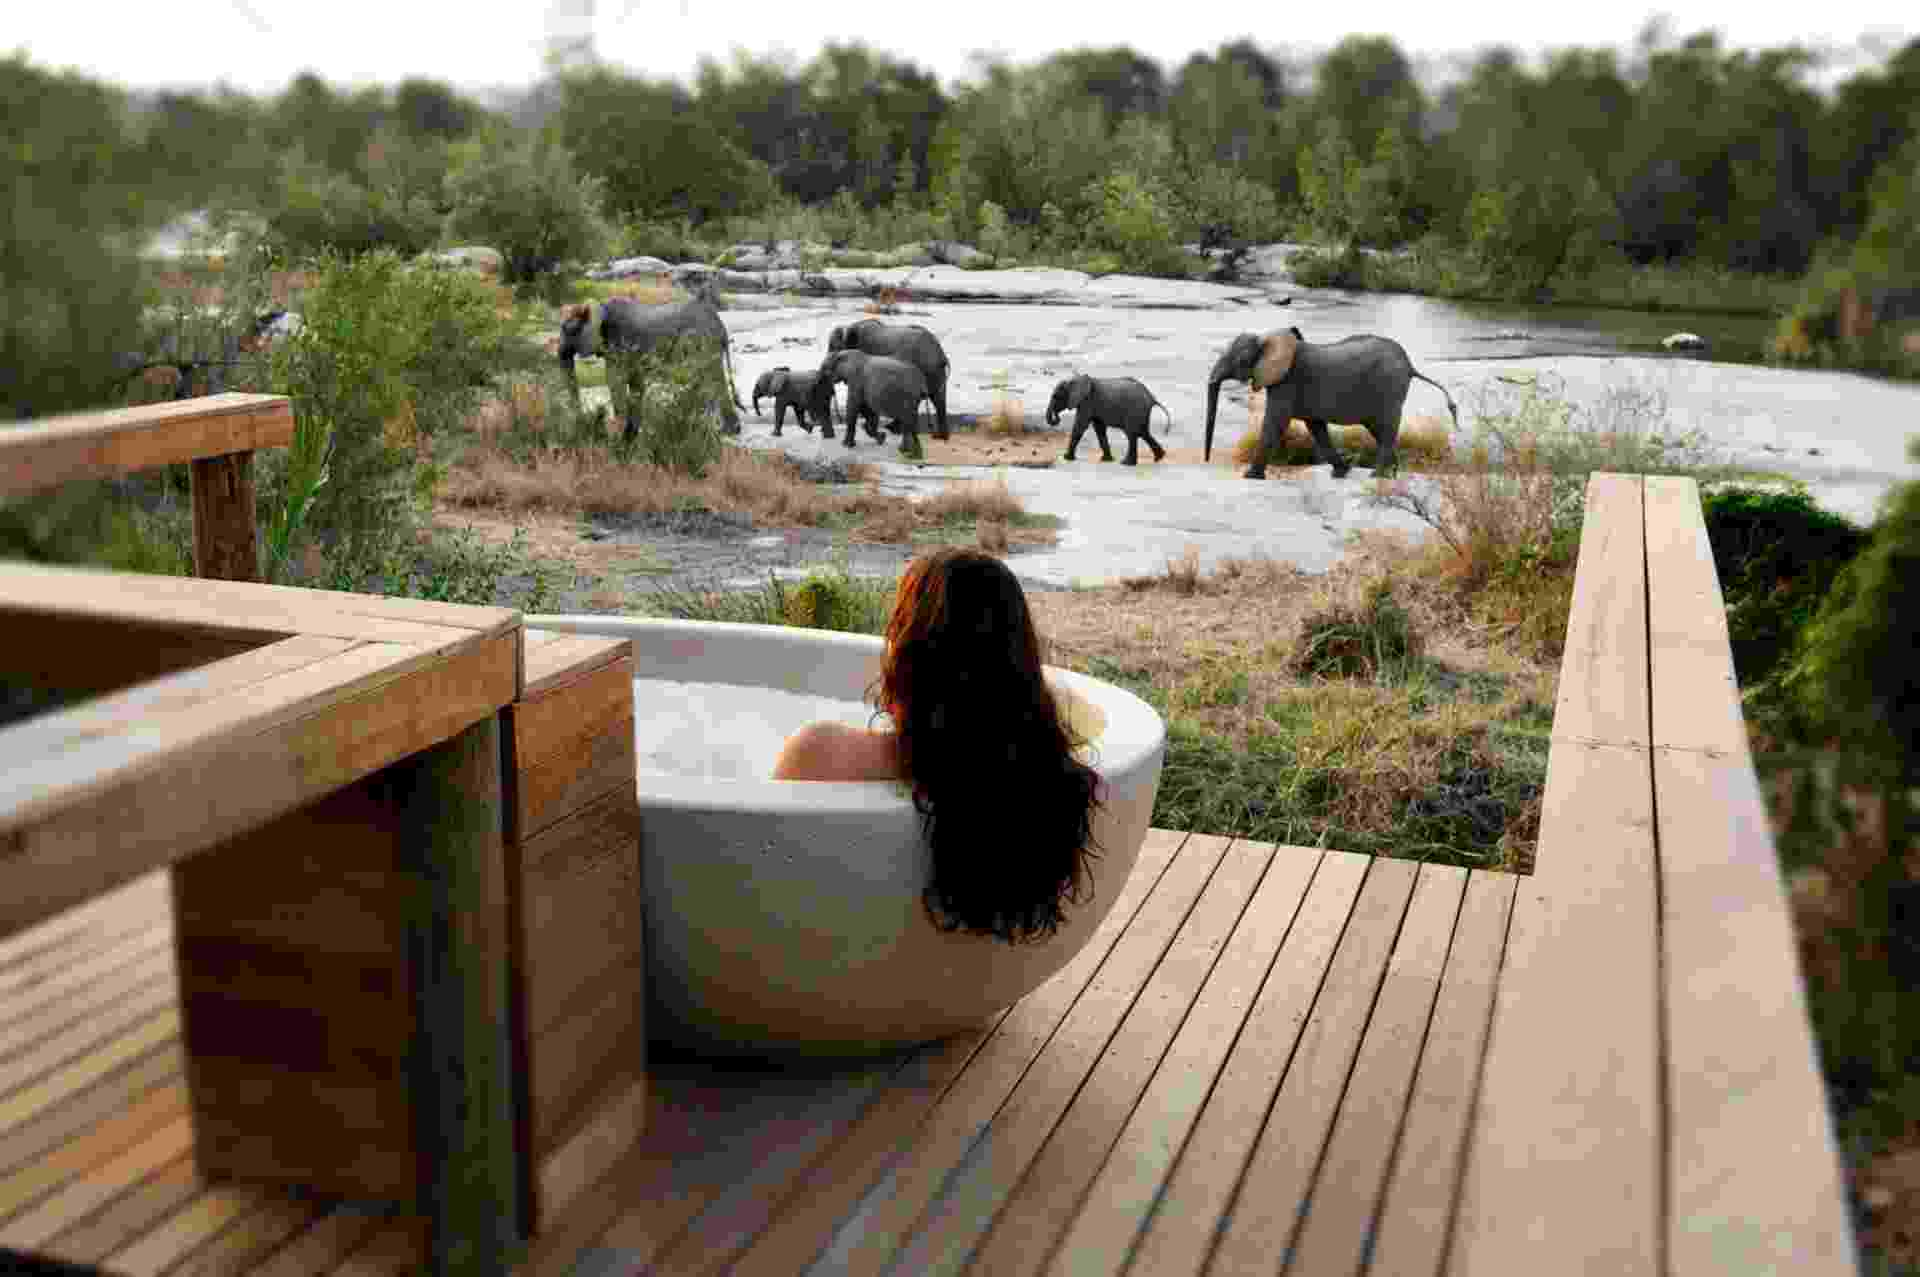 Londolozi Game Reserve, na África do Sul - Divulgação/Londolozi Game Reserve